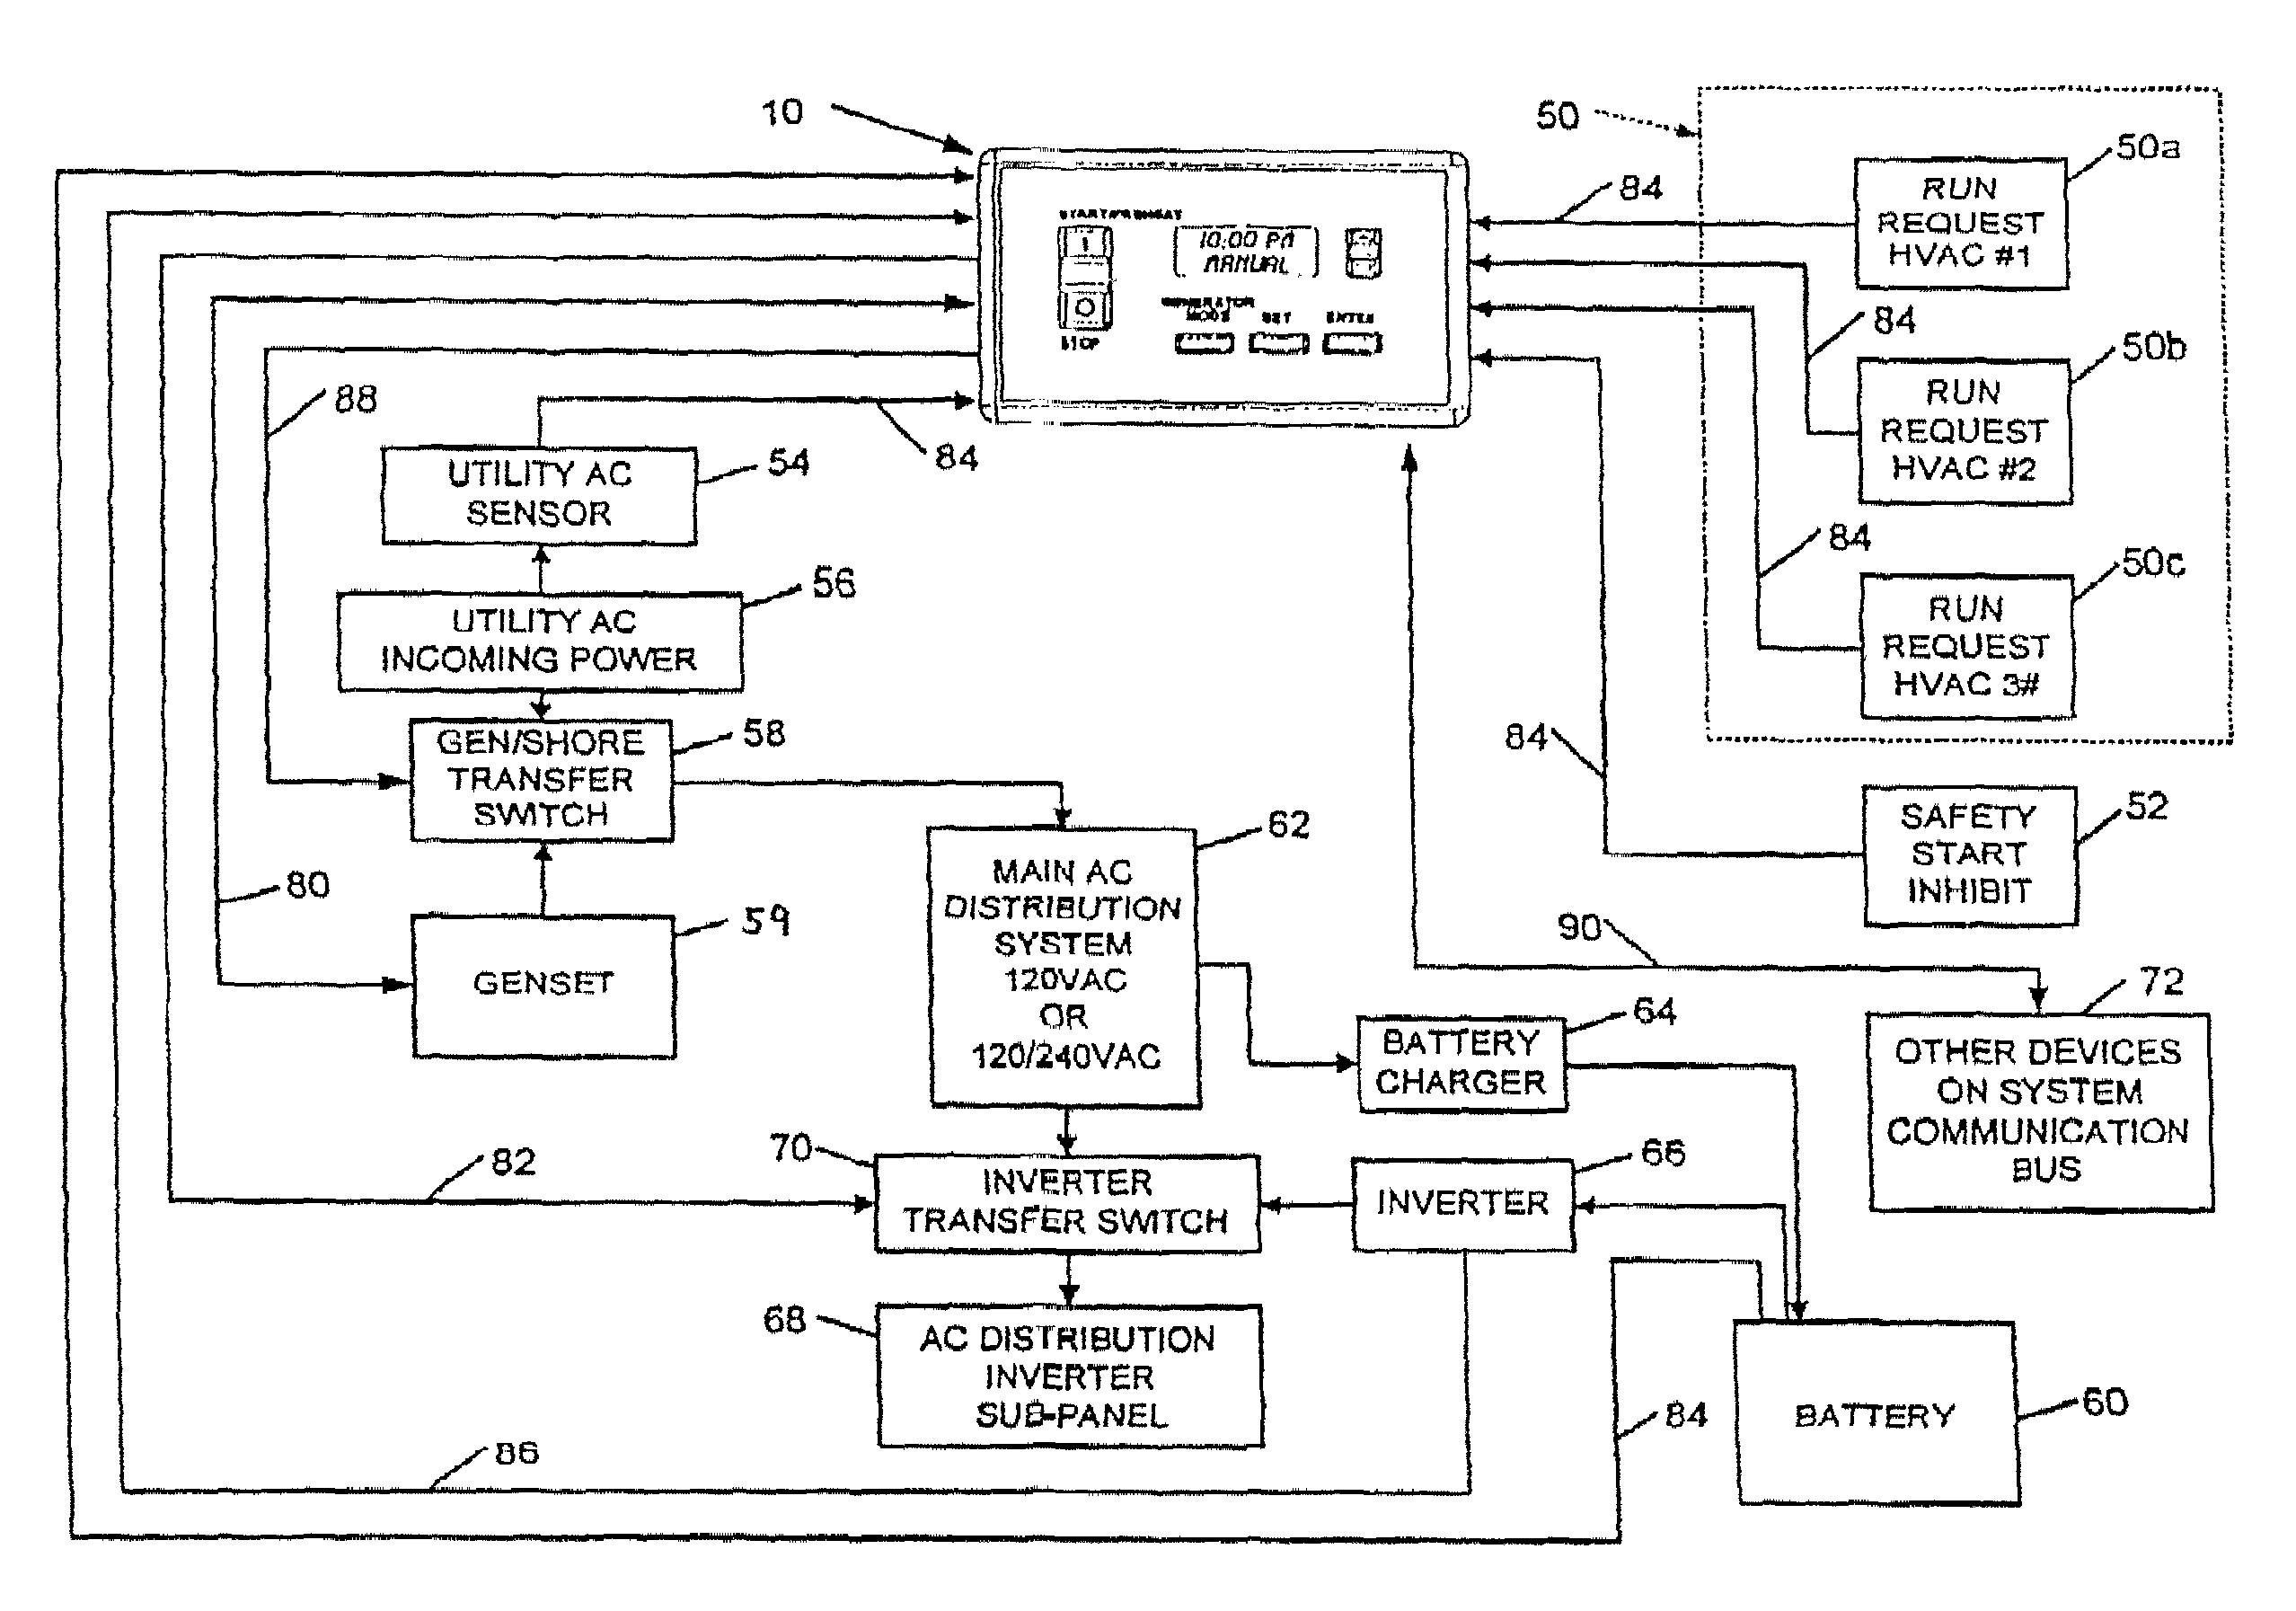 LT_5977] 6 5 Onan Rv Generator Wiring Diagram Free DiagramMonoc Exmet Mohammedshrine Librar Wiring 101